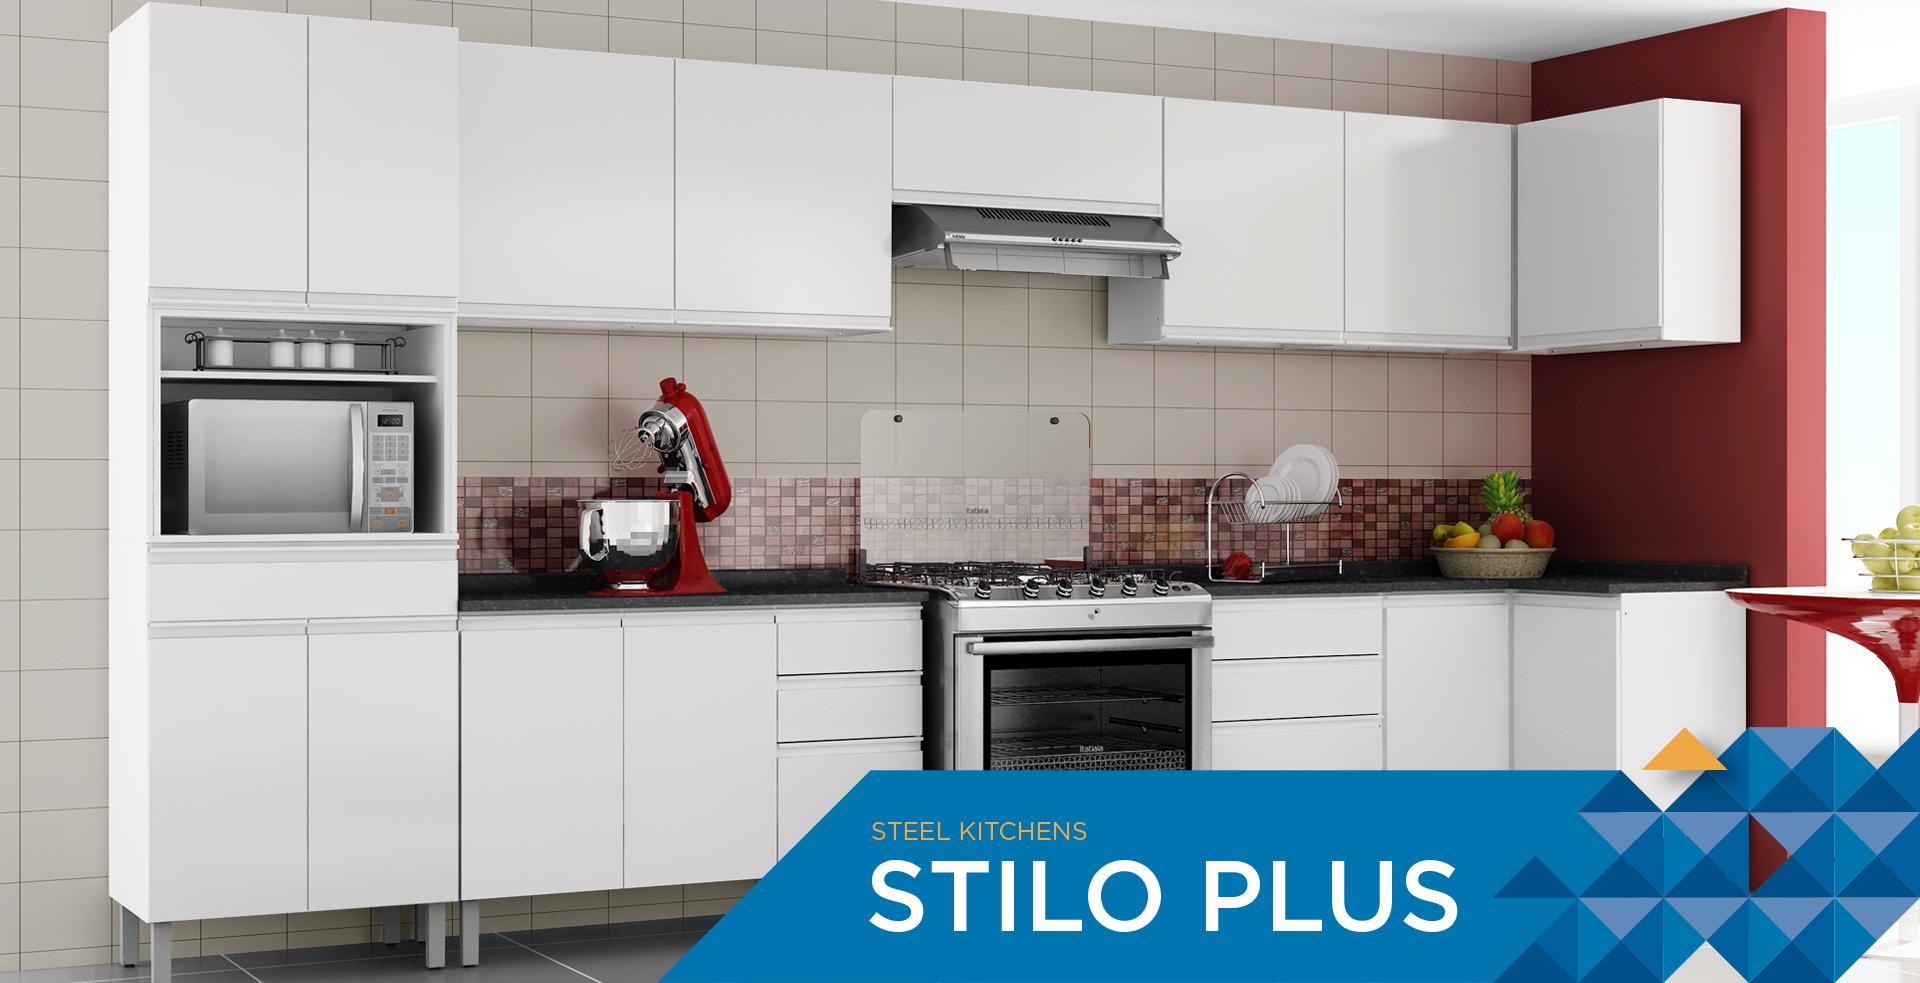 Steel Kitchens Stilo Plus | Cozinhas Itatiaia